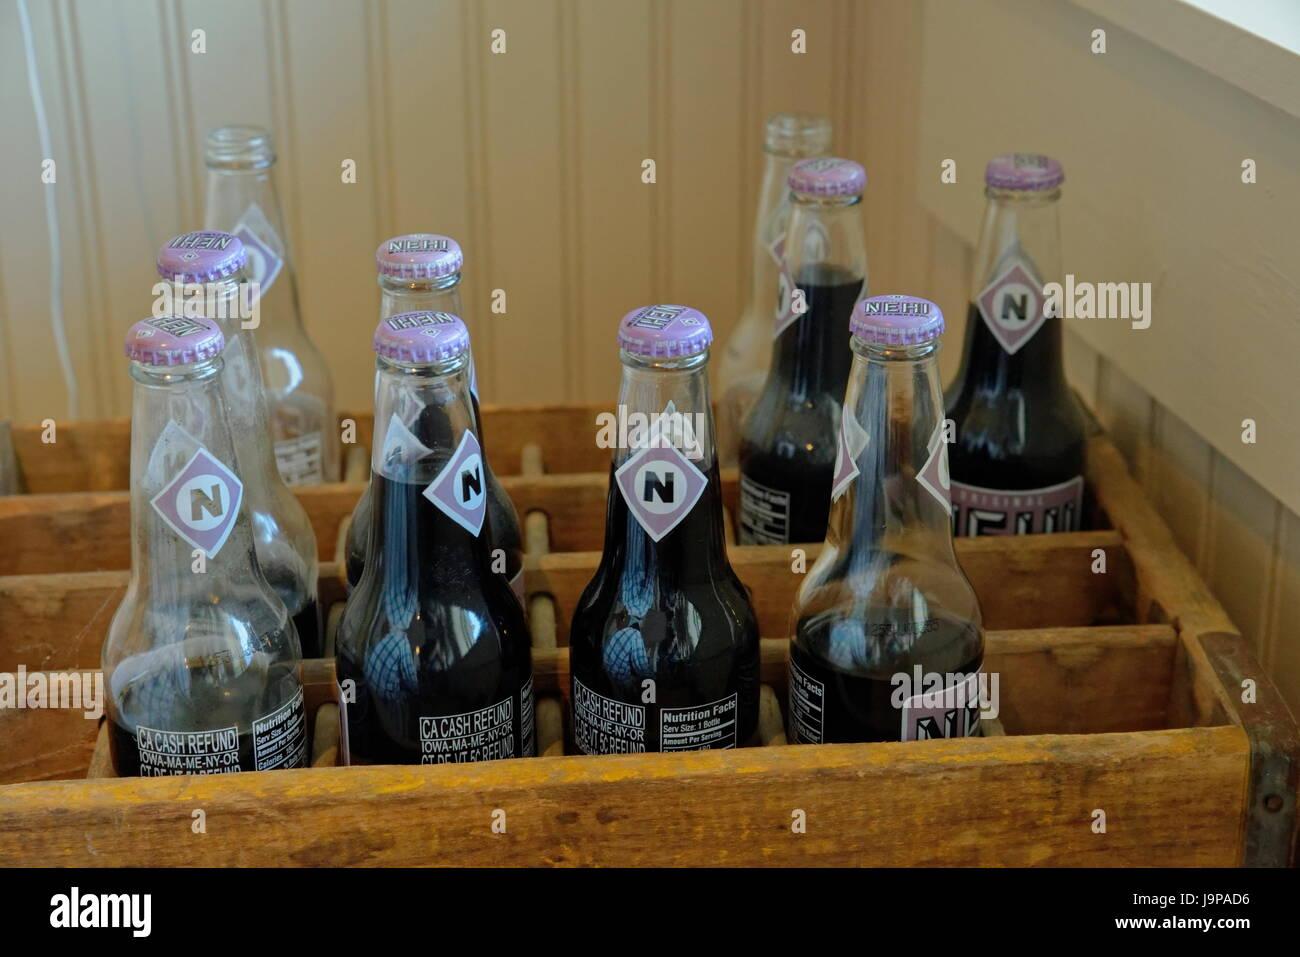 Nehi grape soda bottles in wooden crate Stock Photo - Alamy